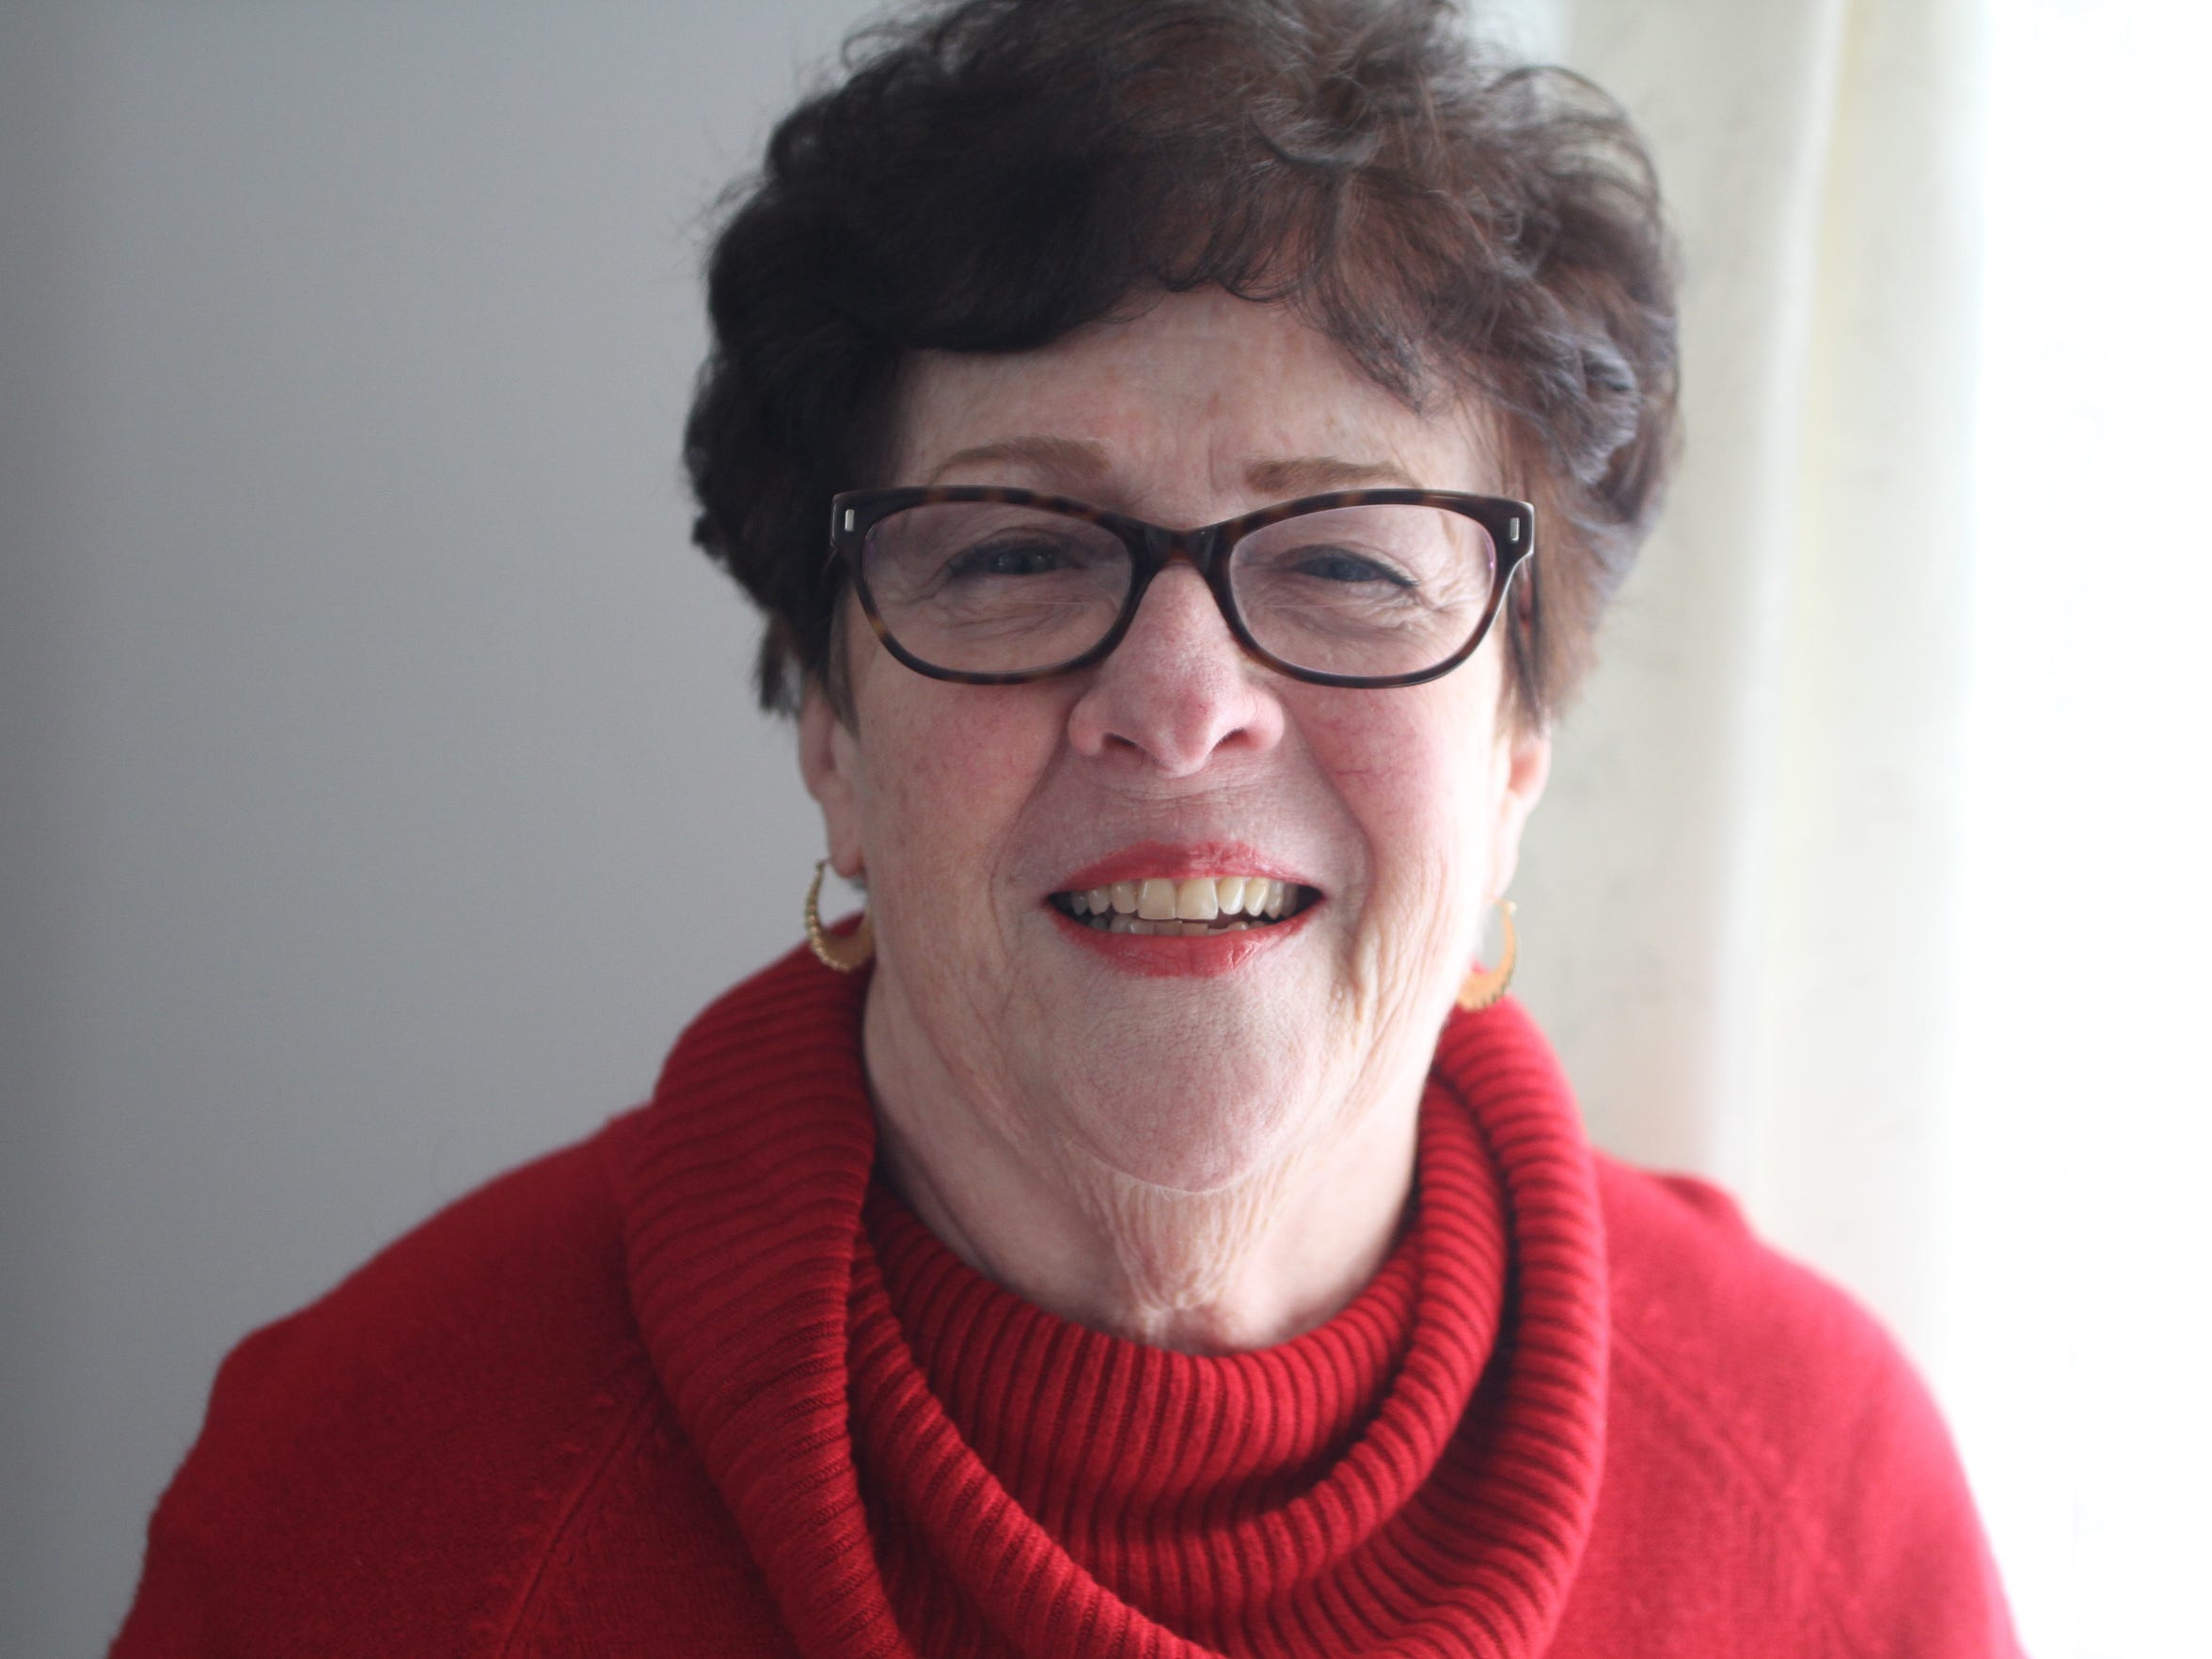 Diana Simpson, 74, of Leonardo is a longtime Republican